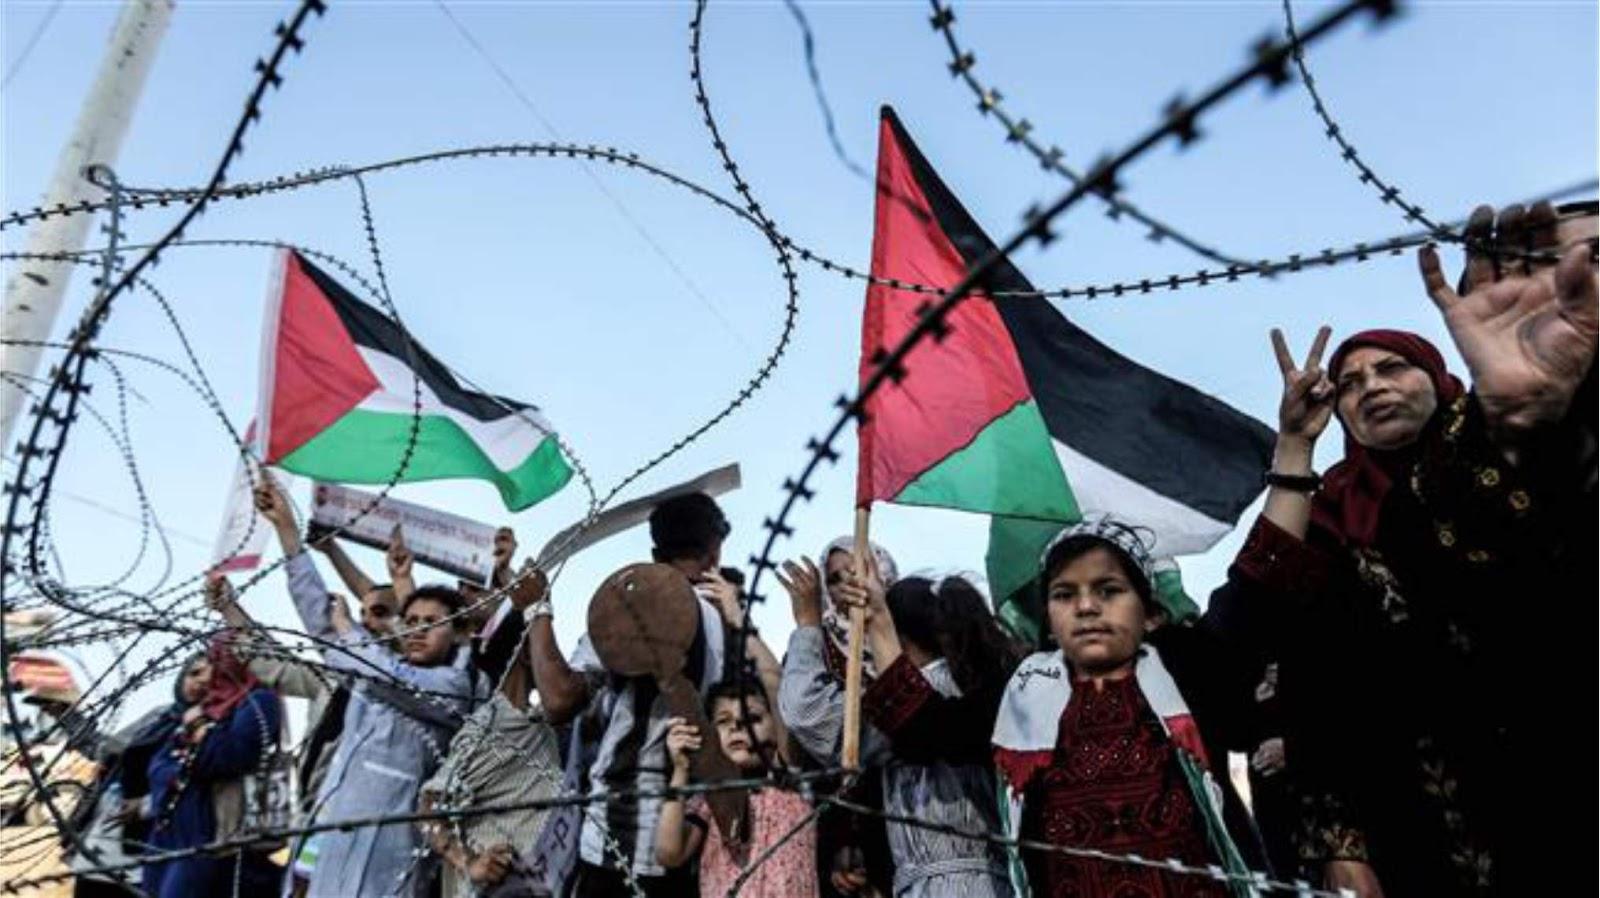 Israel memperketat embargo di Gaza, menghentikan pengiriman bahan bakar